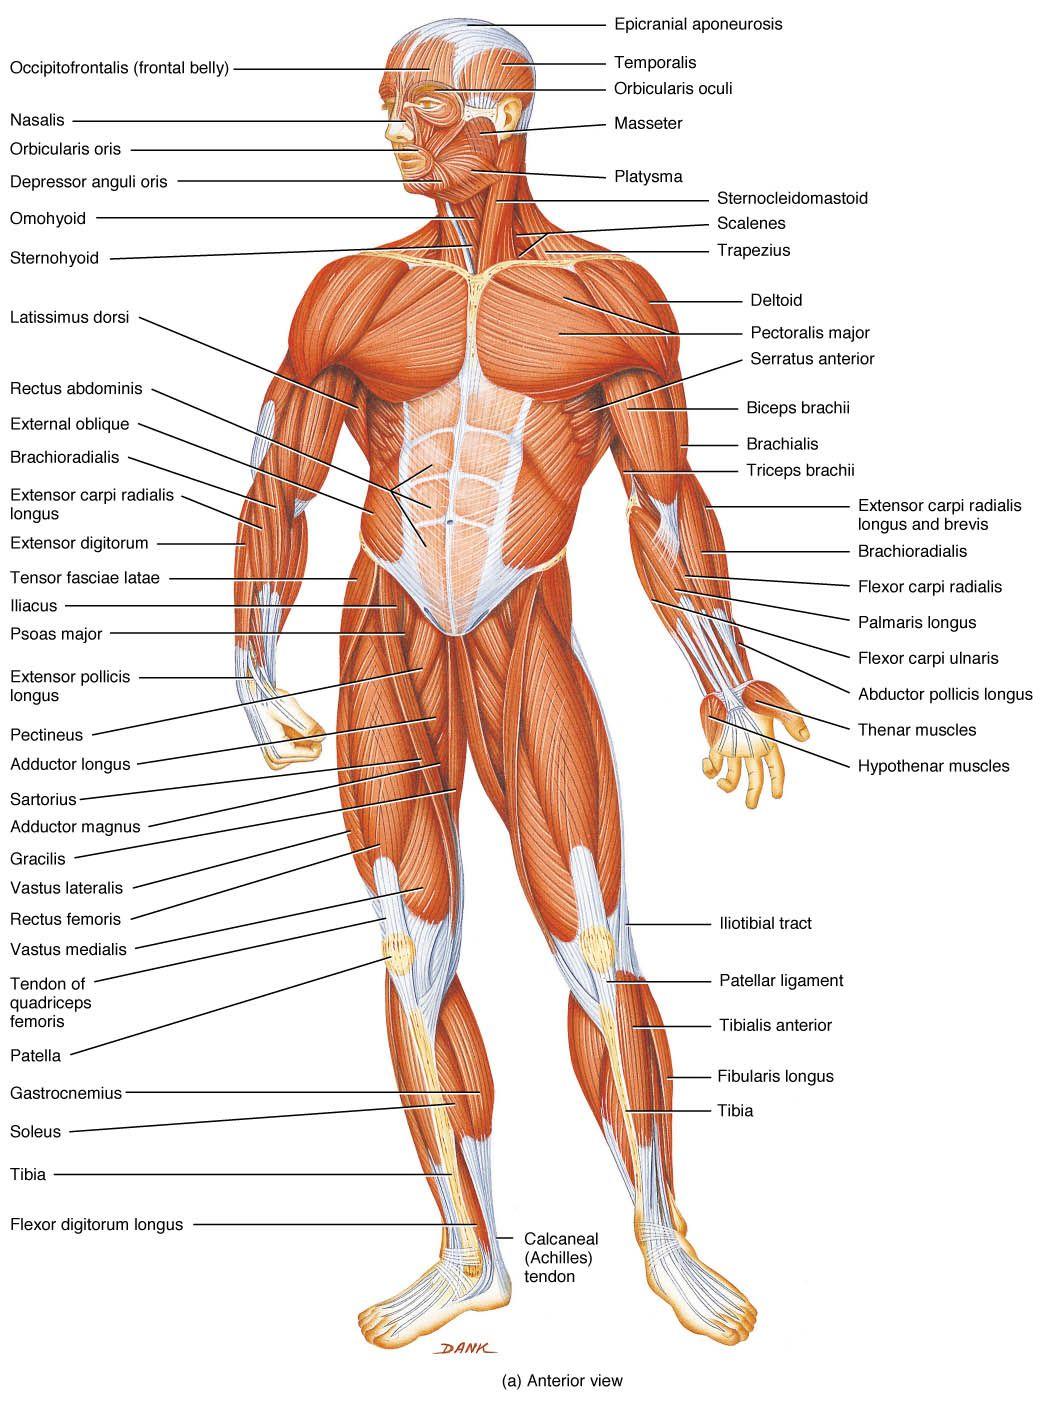 Full Human Anatomy Diagram Human Anatomy Study Pinterest Human